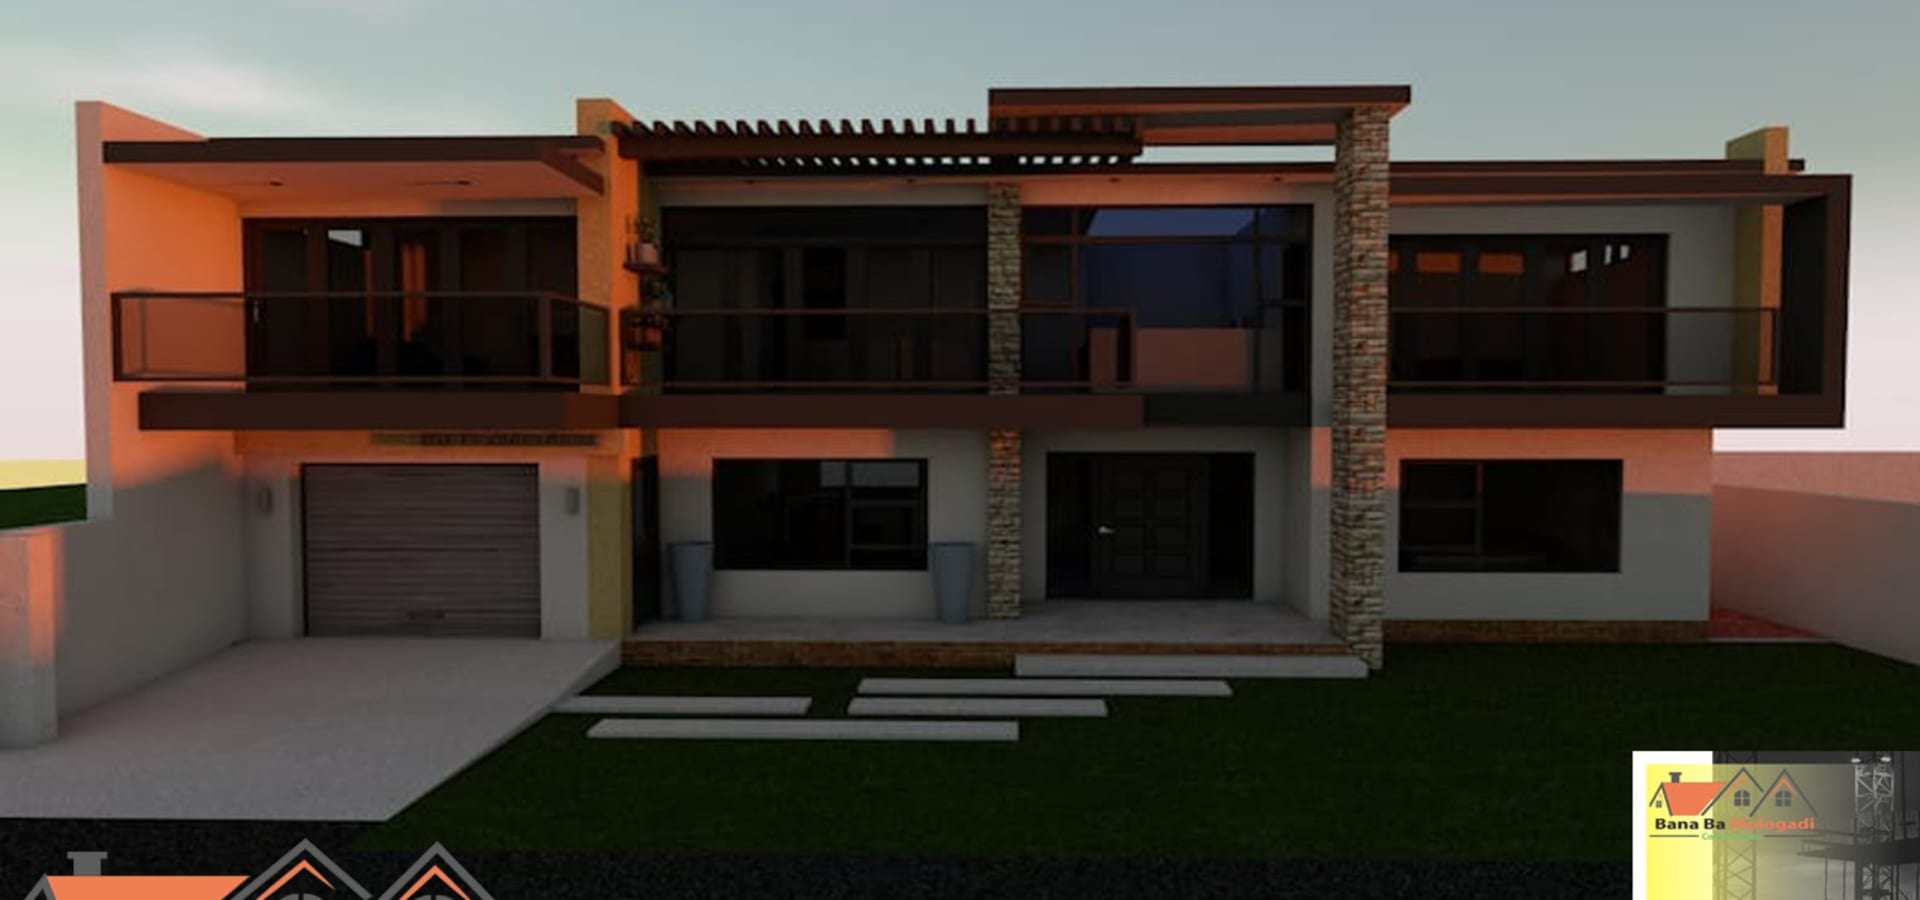 Bana Ba Mologadi Constructions